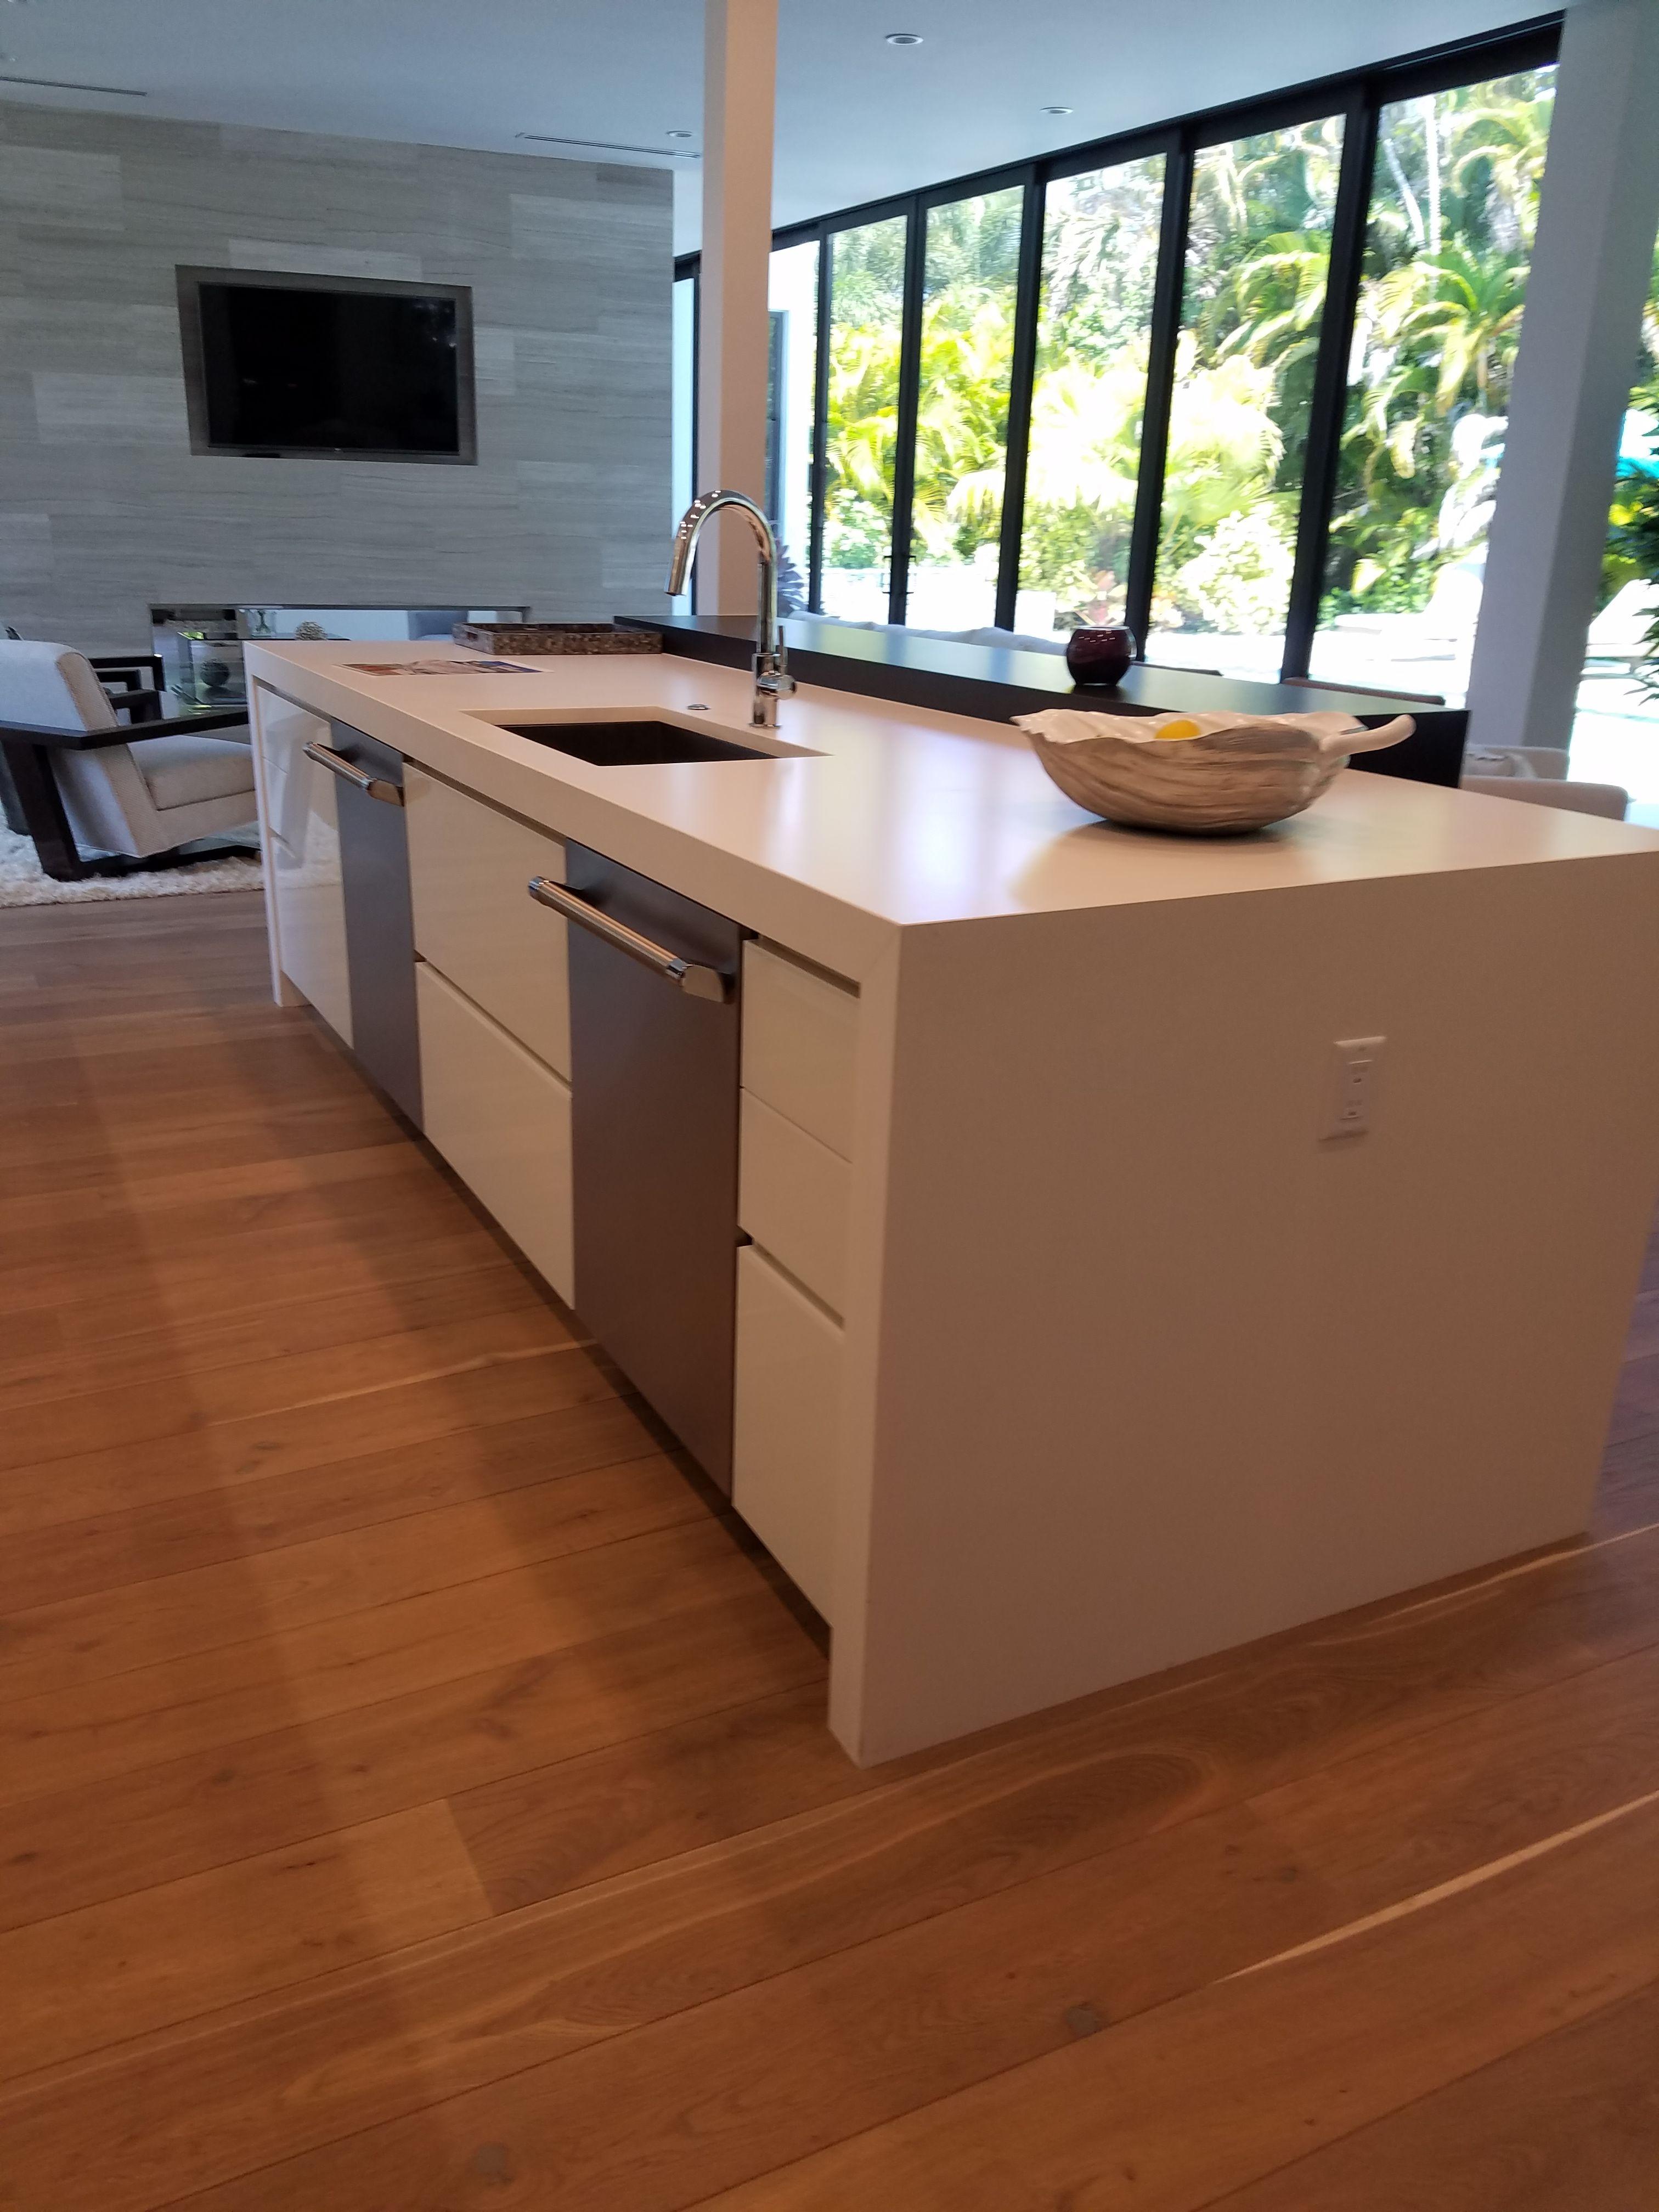 Ultracraft Cabinets Coastal Grey Coastal Kitchen Interiors Cki Naples Fl Ultracraft Kitchen Interior Kitchen Design Small Cottage Kitchen Cabinets